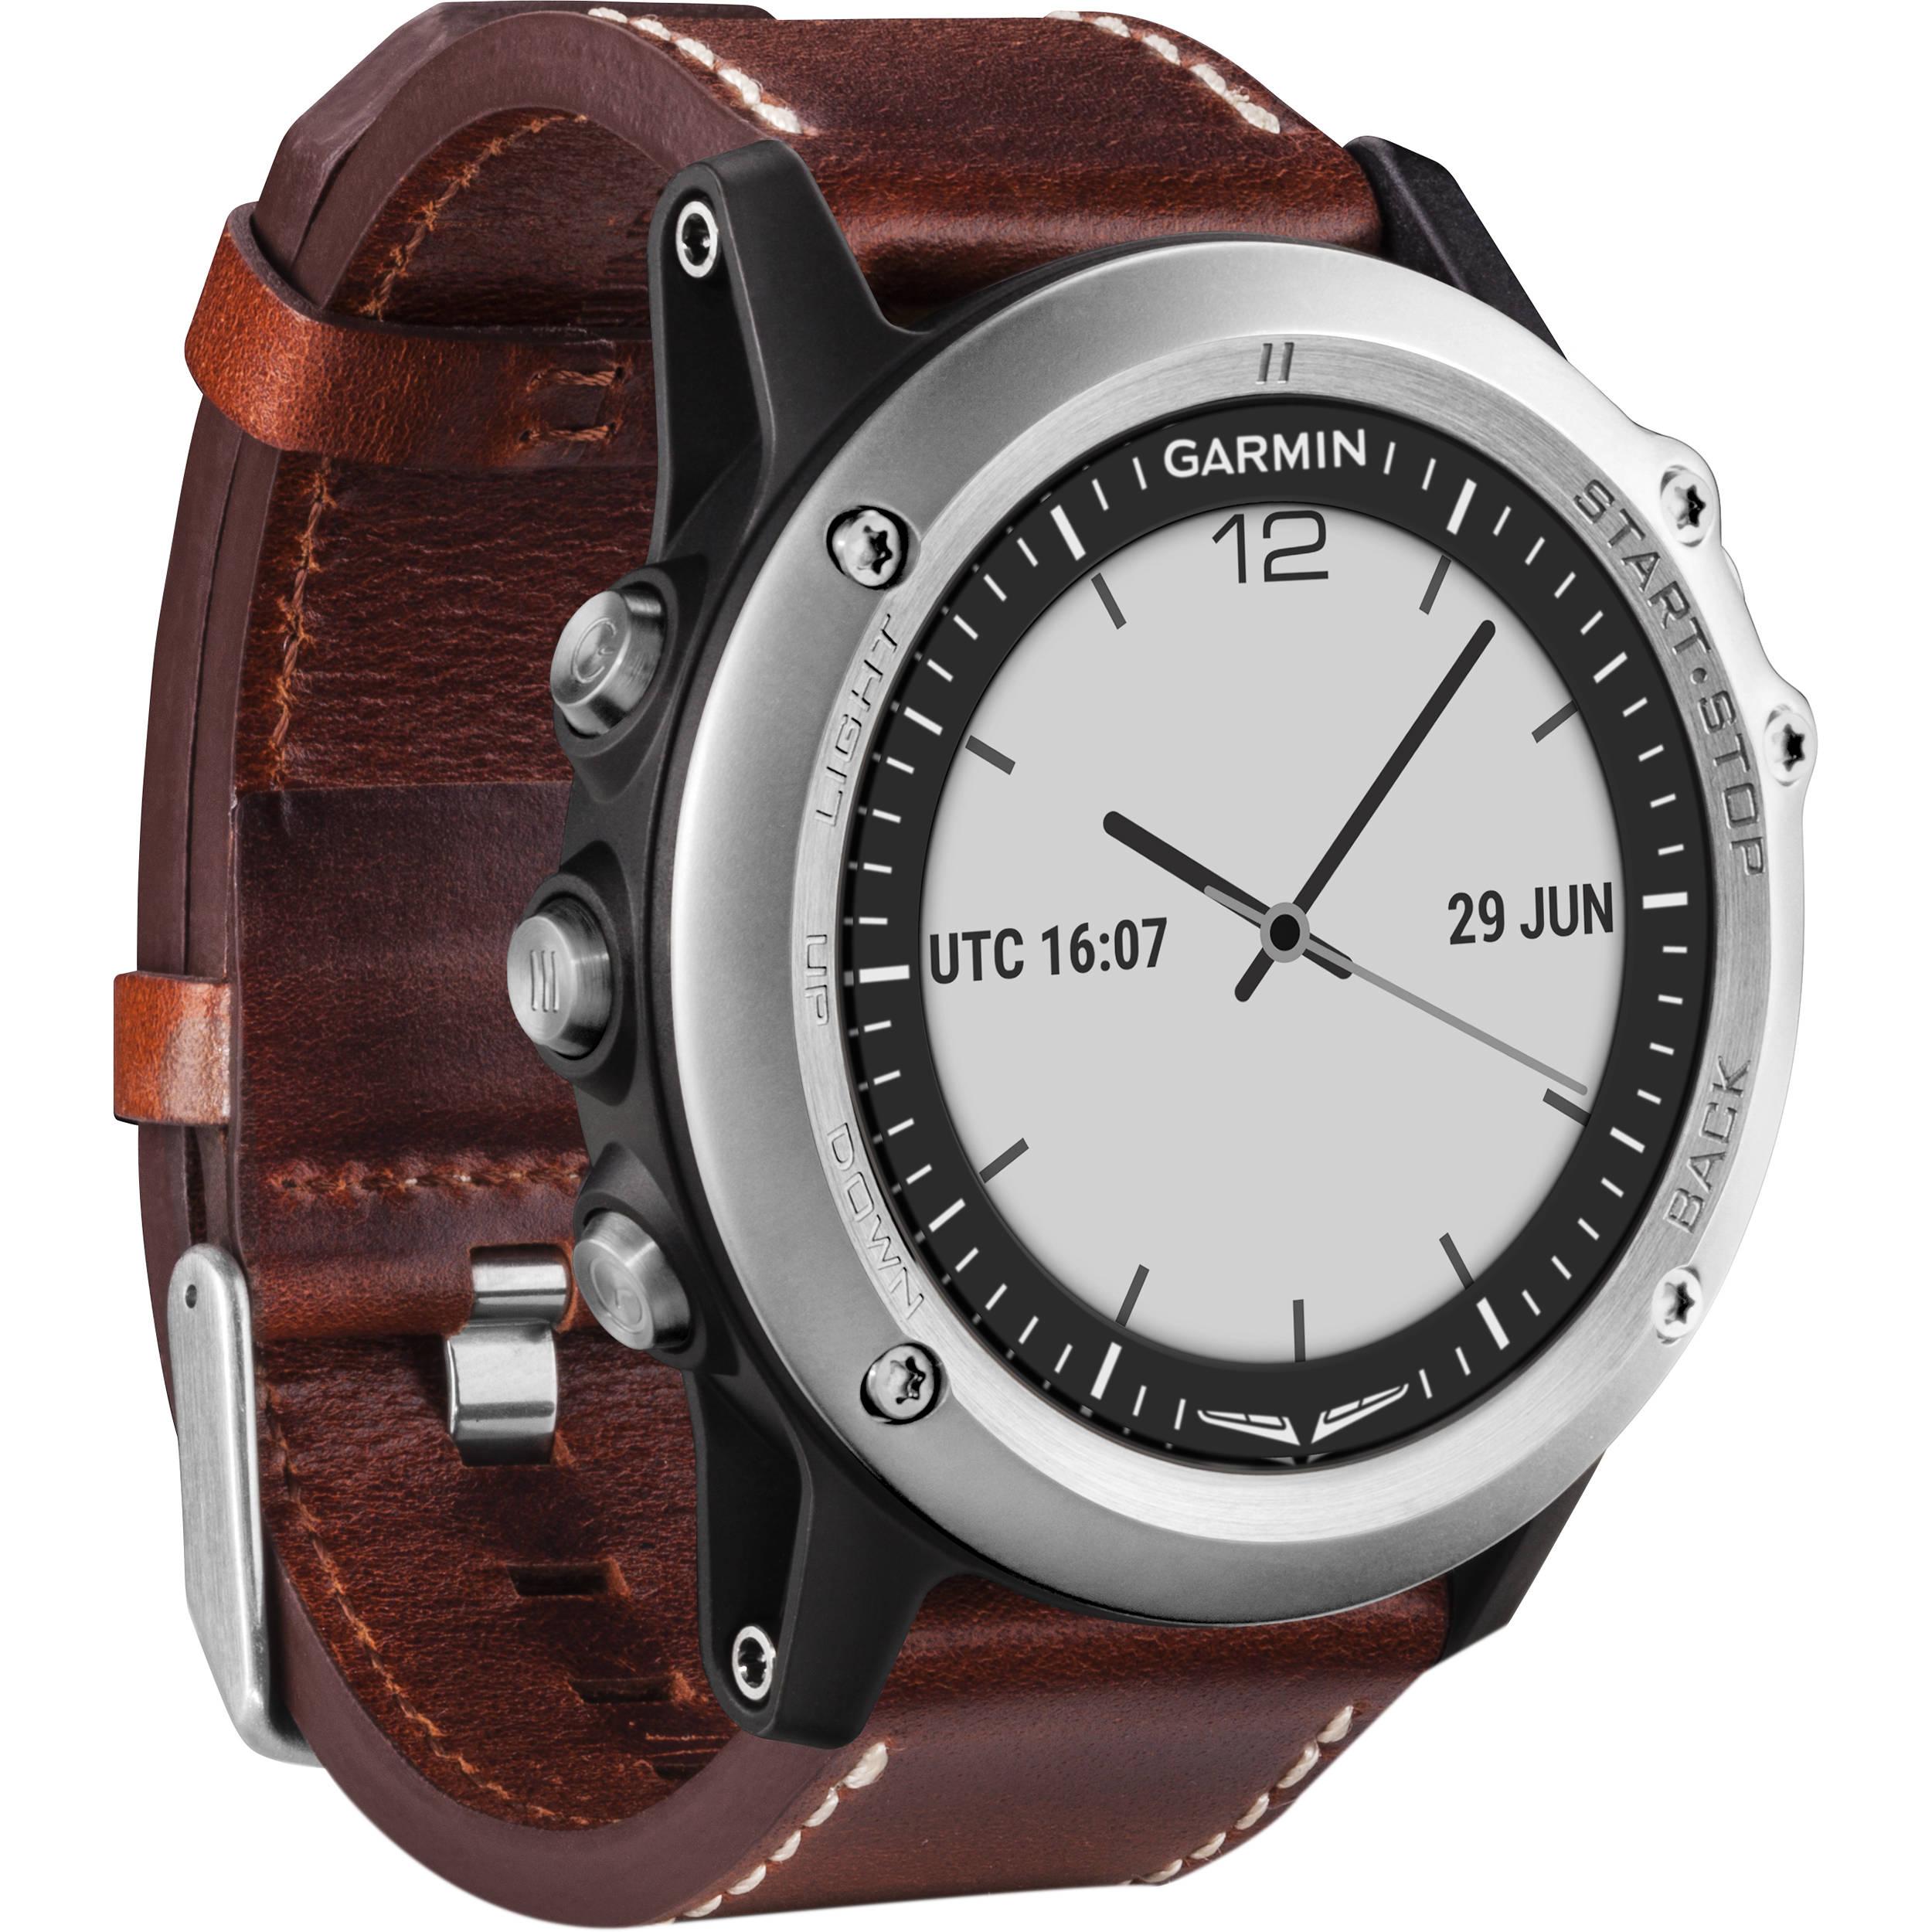 036a7281ba9 Garmin D2 Bravo GPS Aviator Navigation Watch (Brown Leather Band)